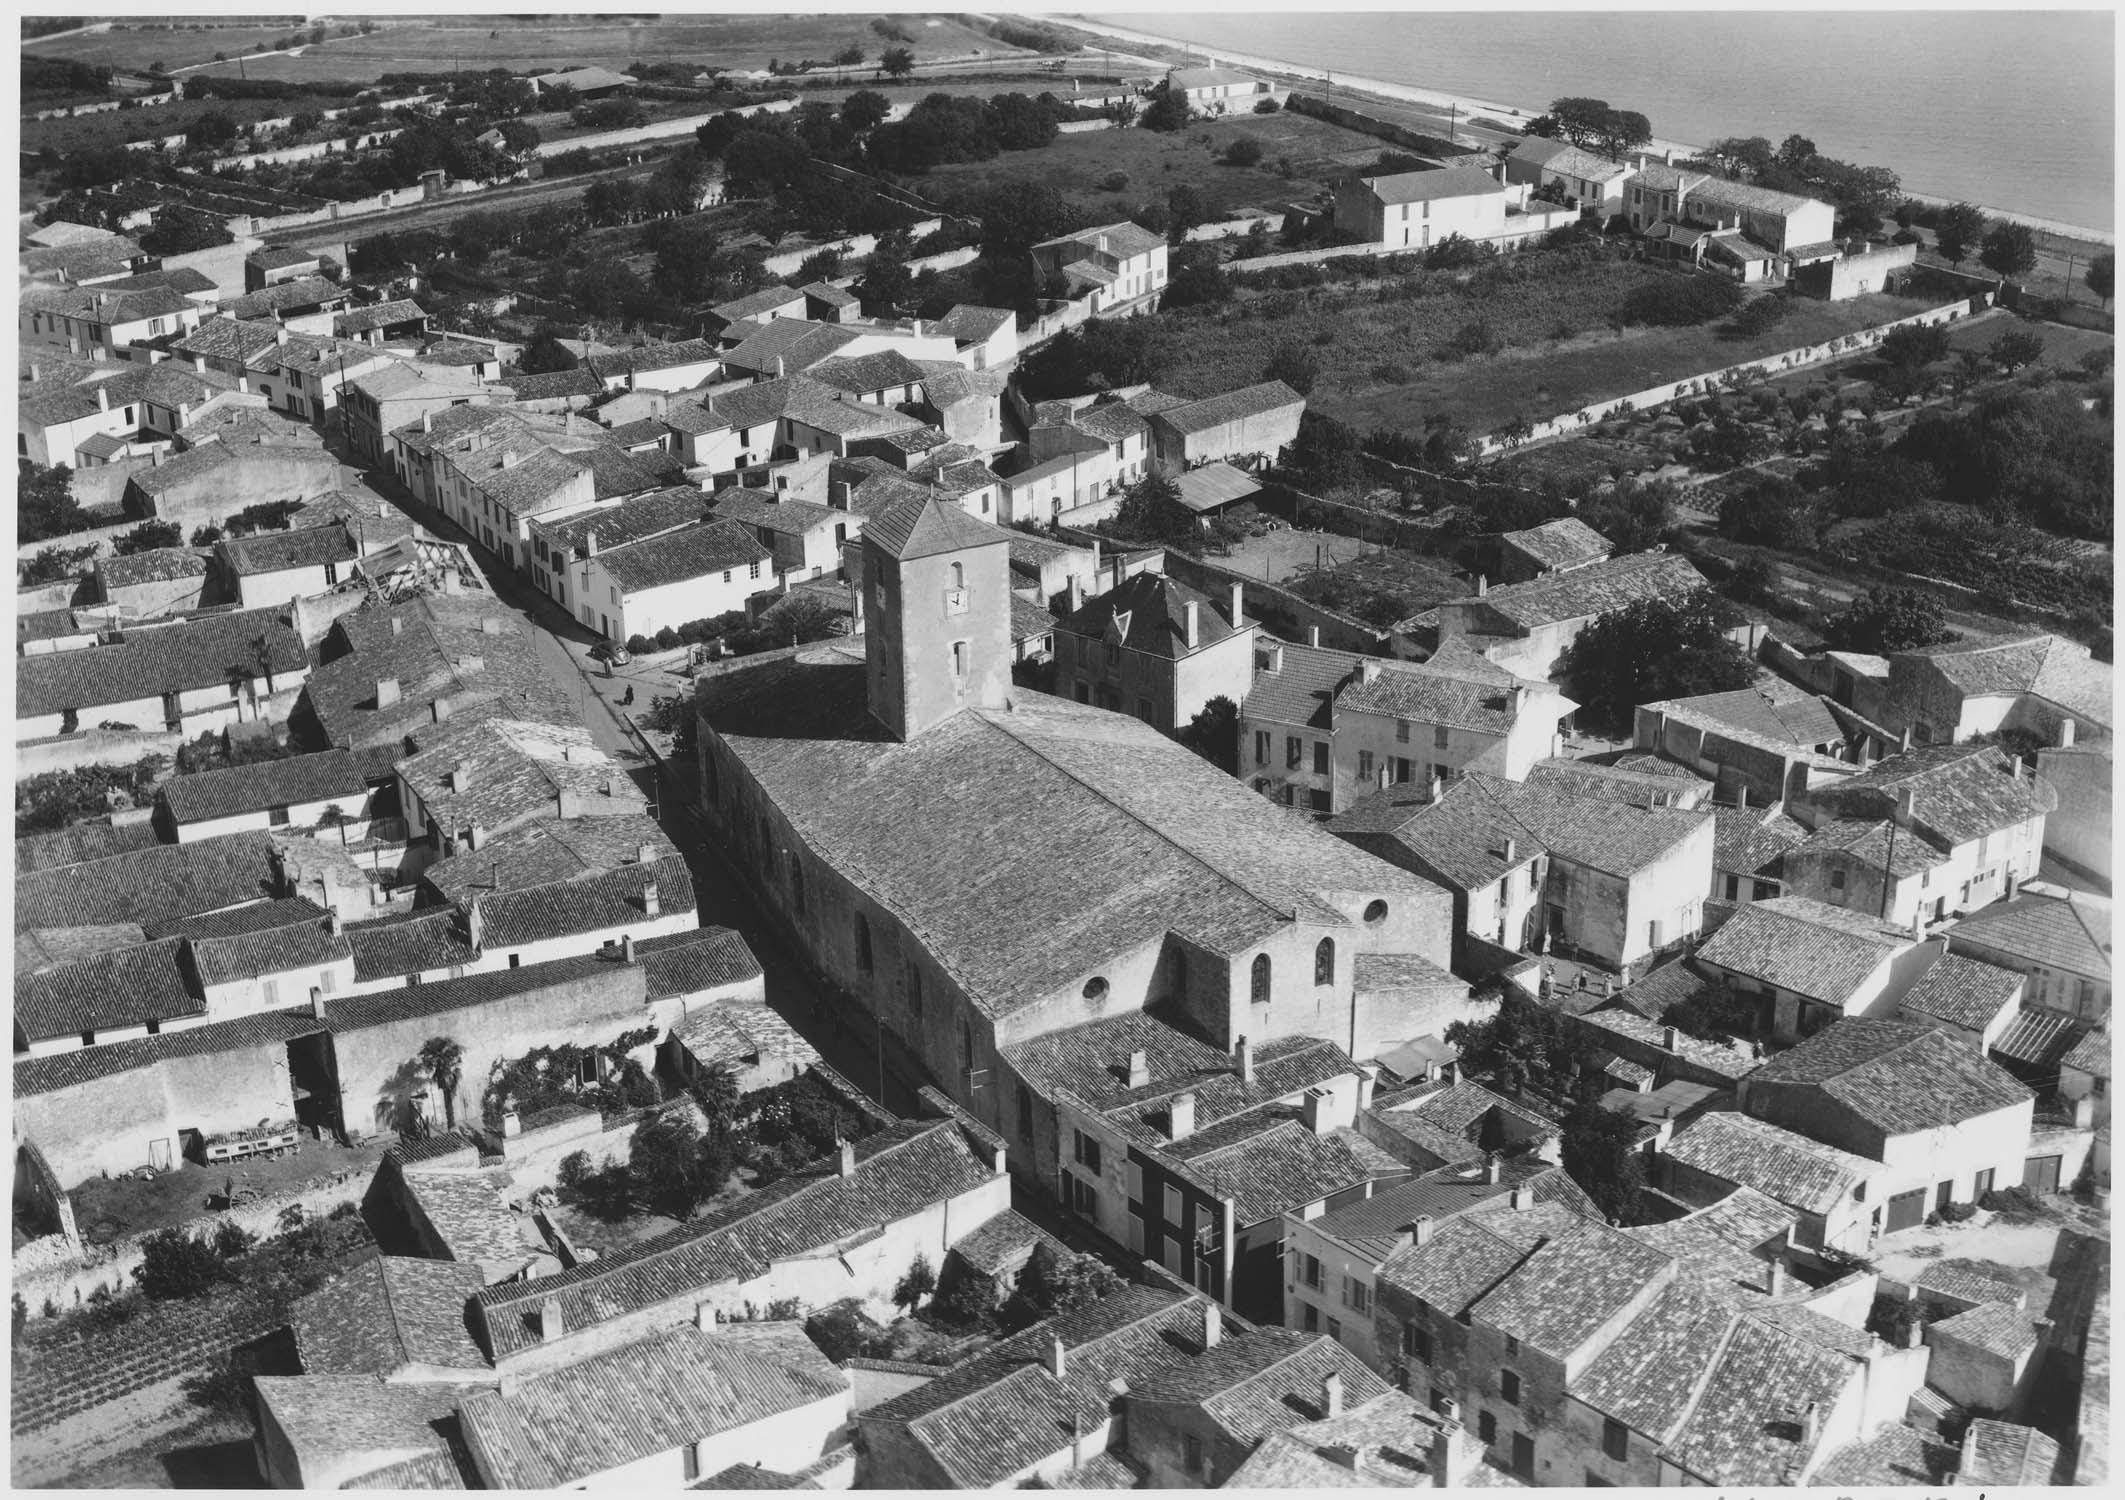 Eglise paroissiale Sainte-Catherine